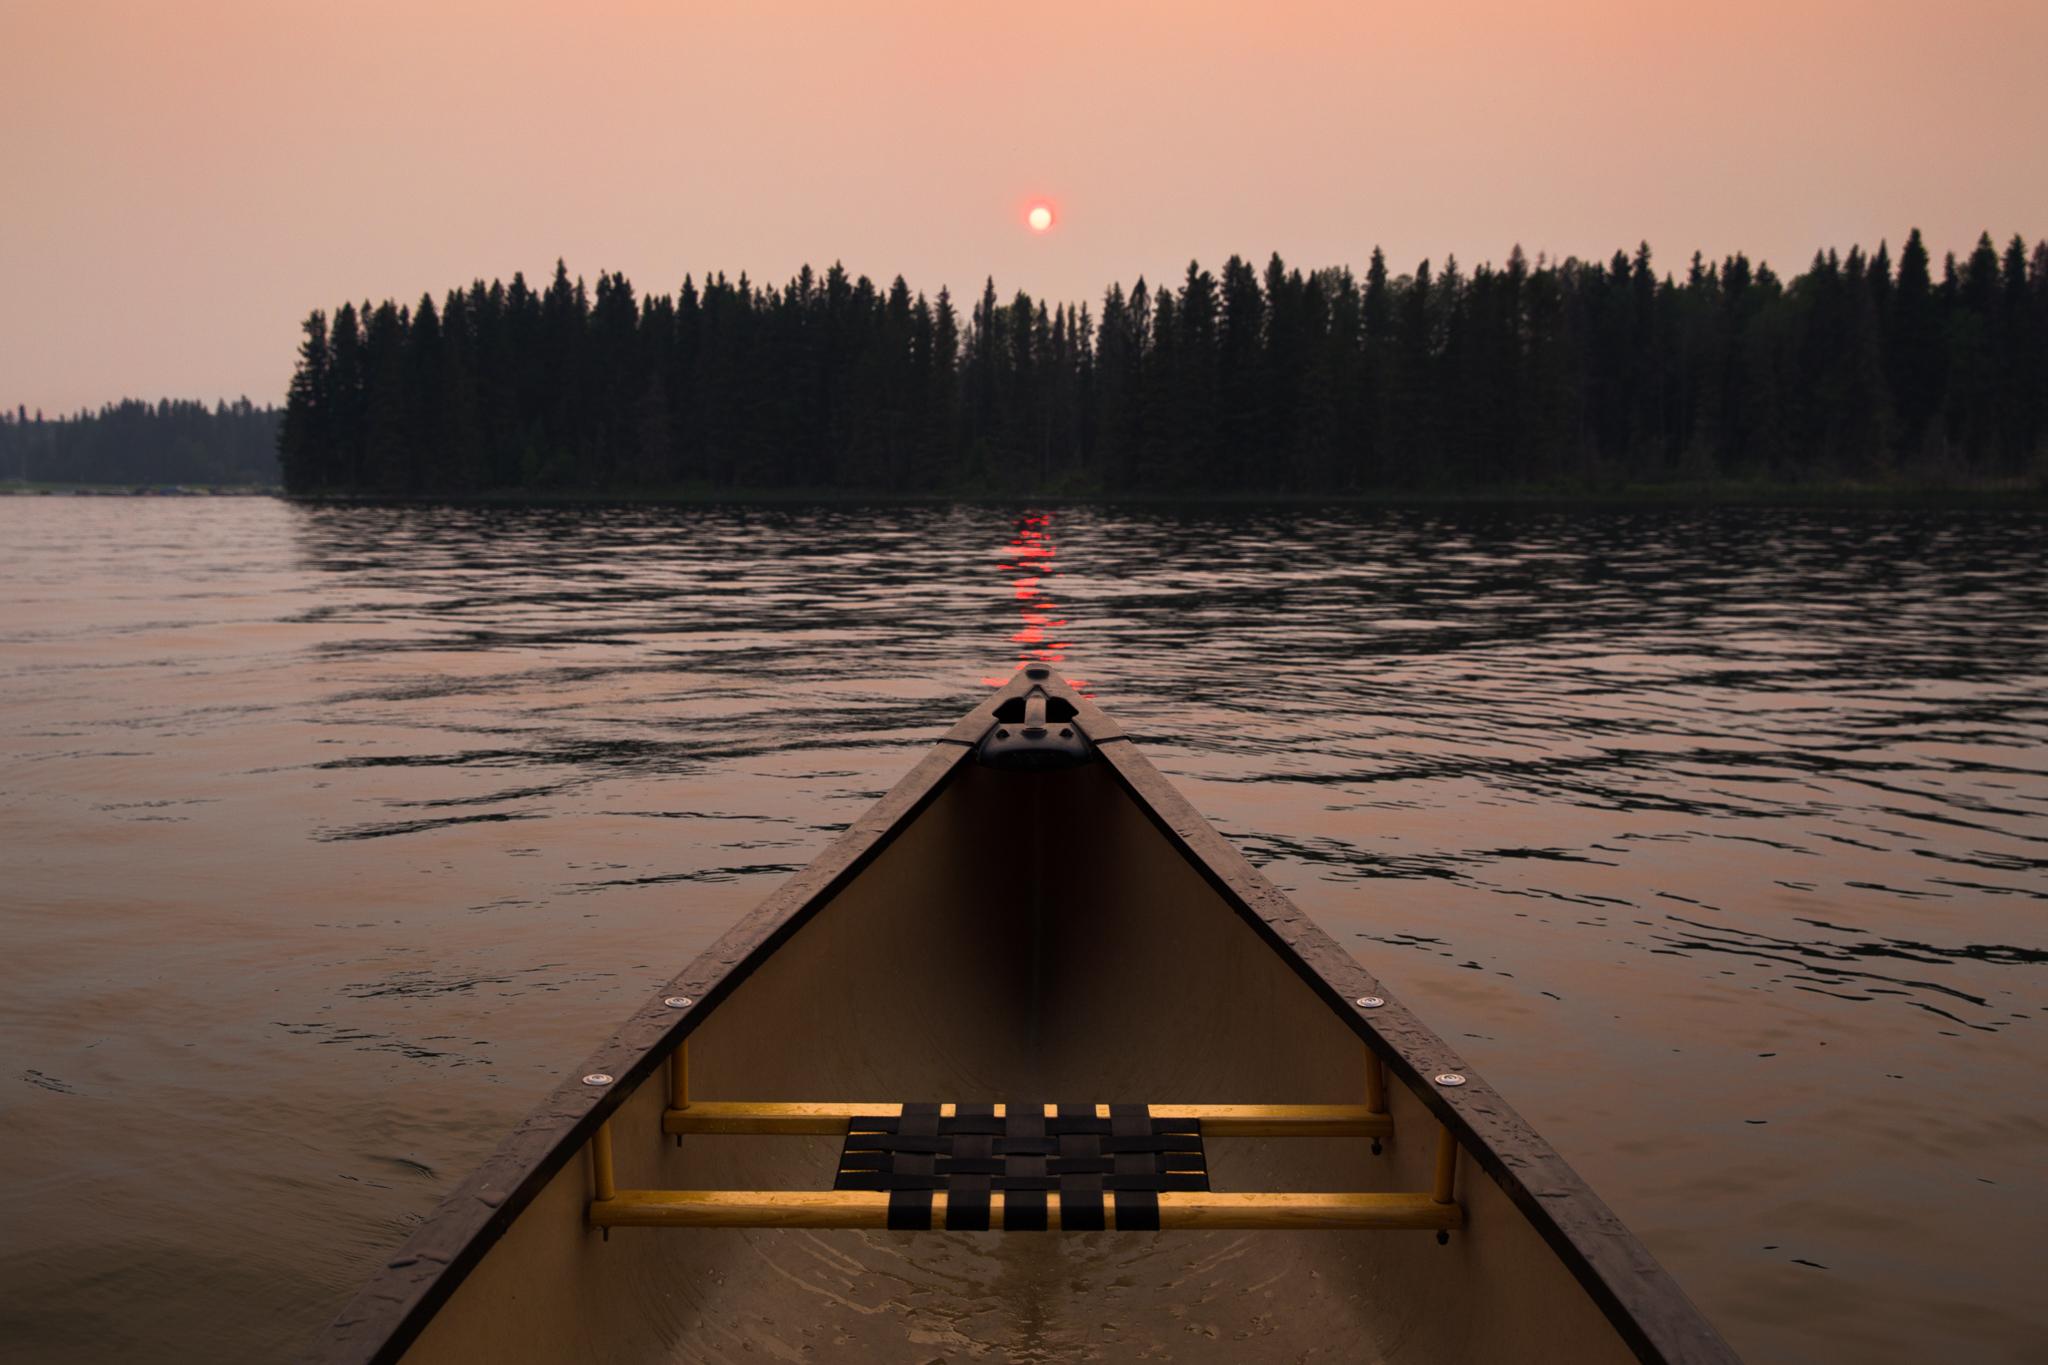 Canoe Waskesiu